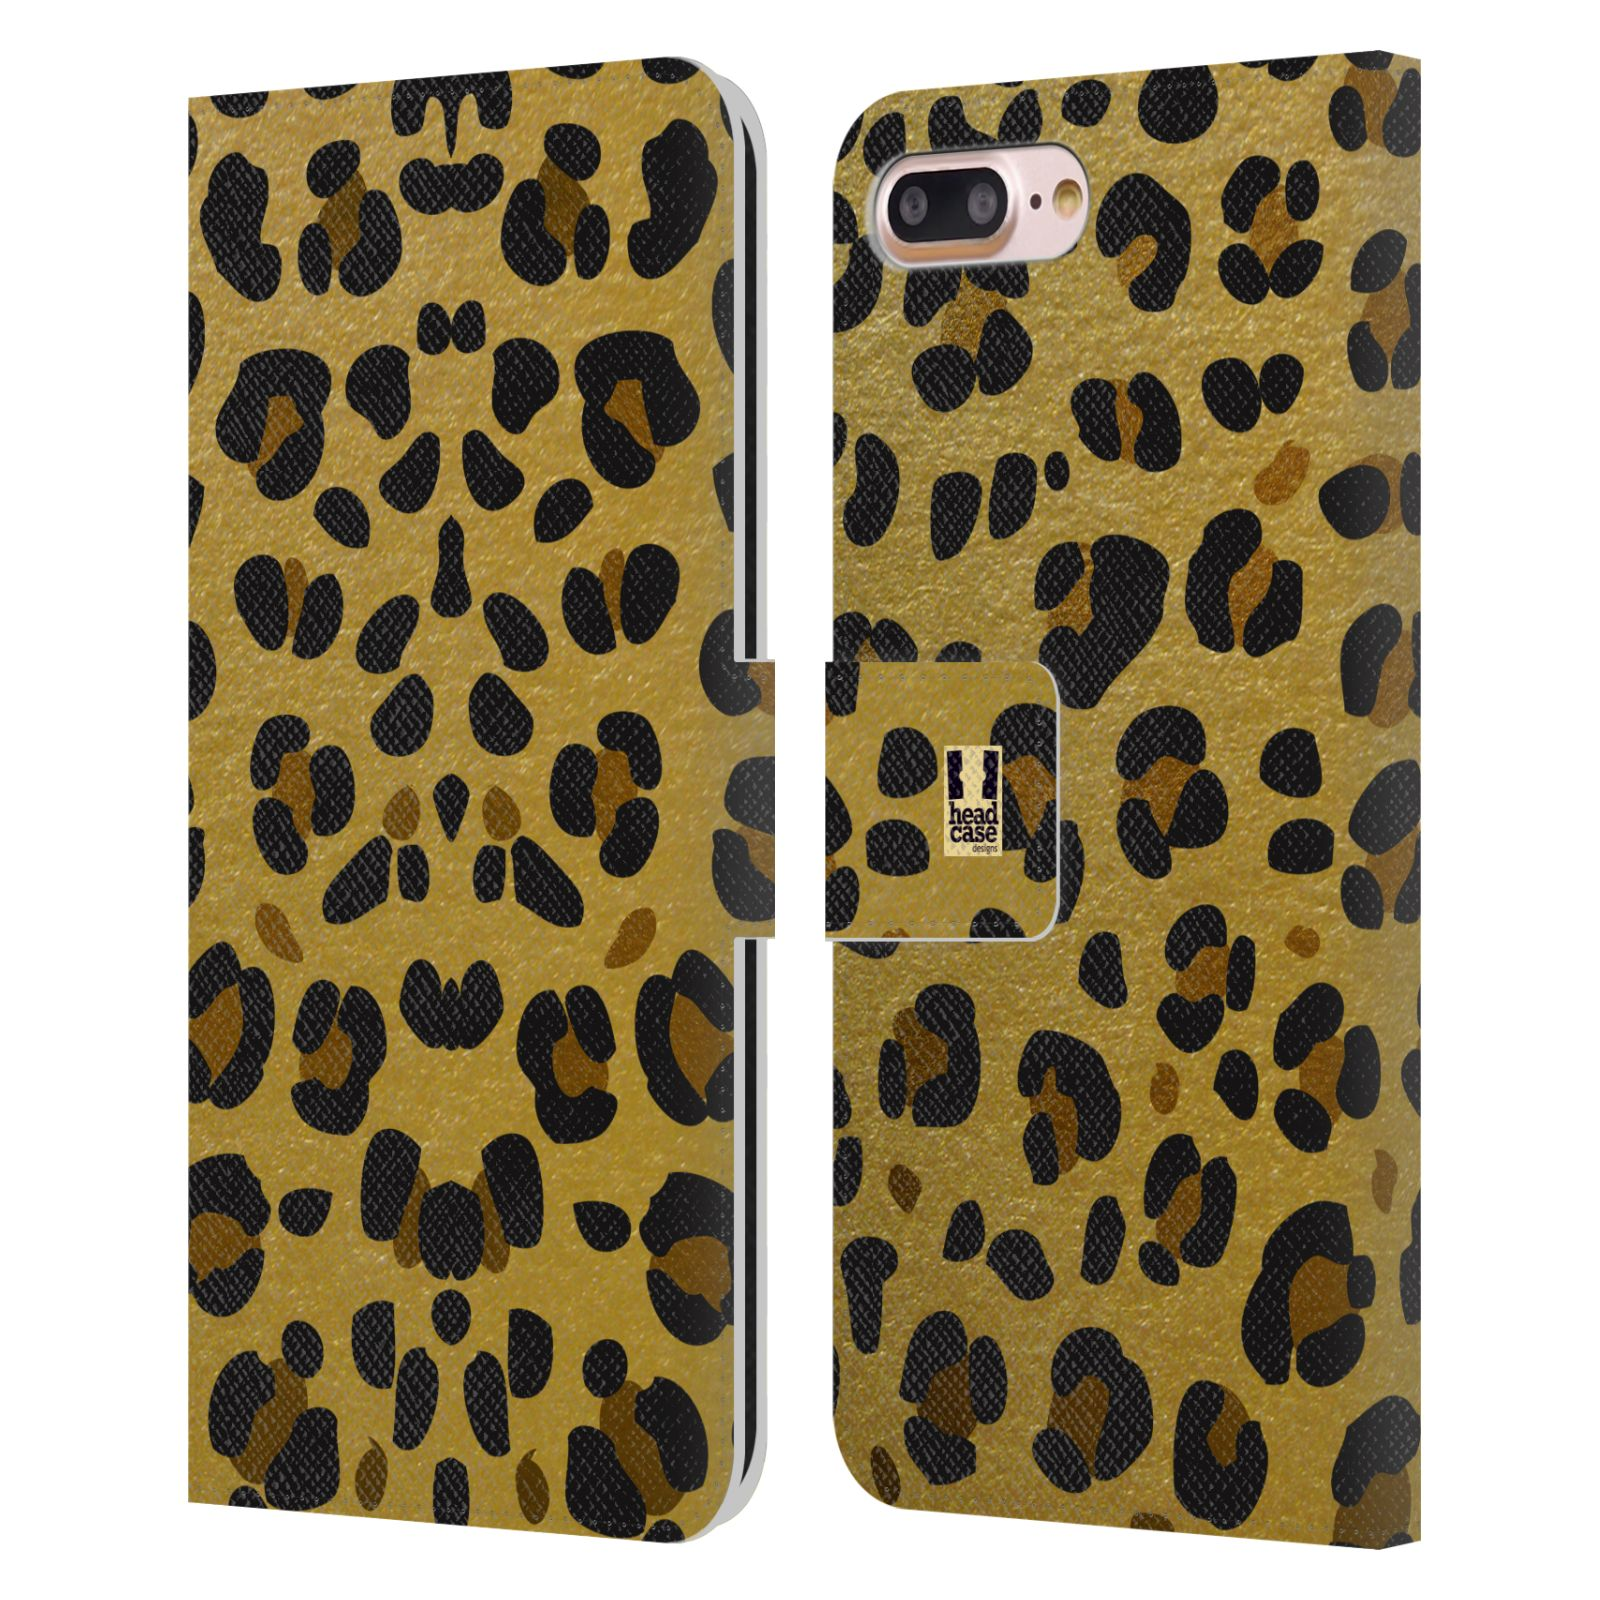 Pouzdro na mobil Apple Iphone 7 Plus / 8 Plus - Head Case - Fashion zvířecí vzor